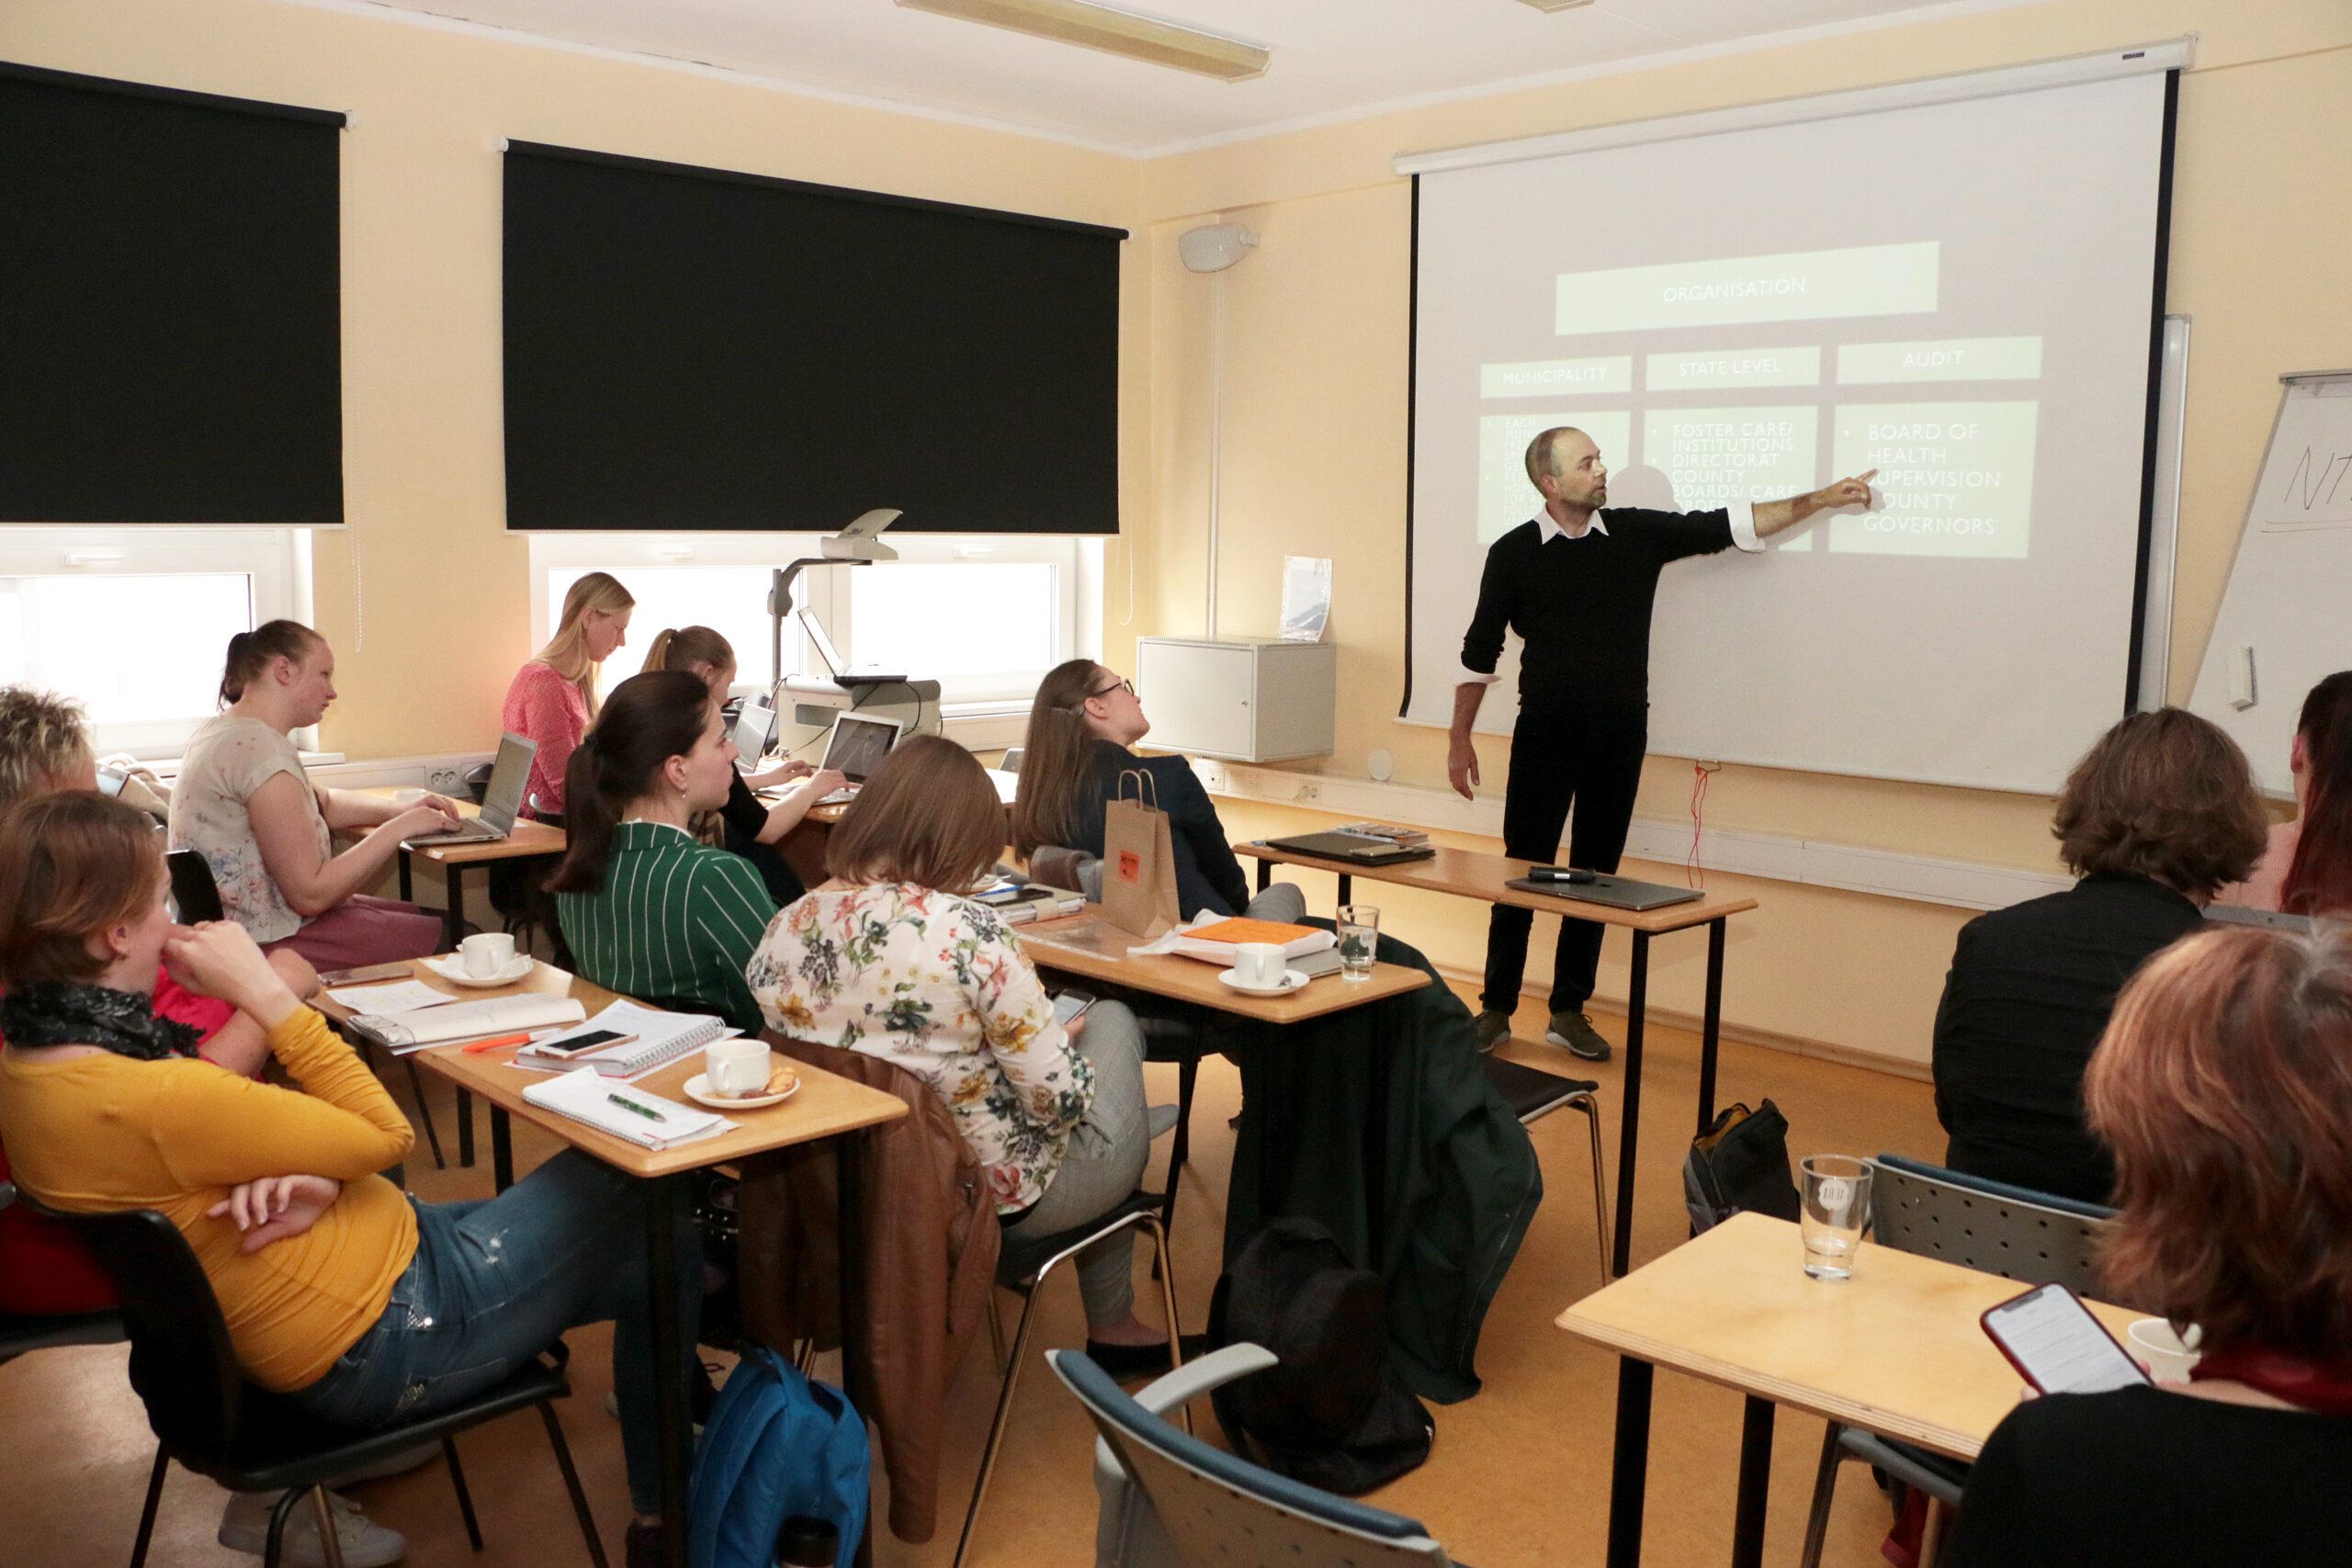 Asgeir Falch-Eriksen, Networking Lab in Tallinn University, 2019